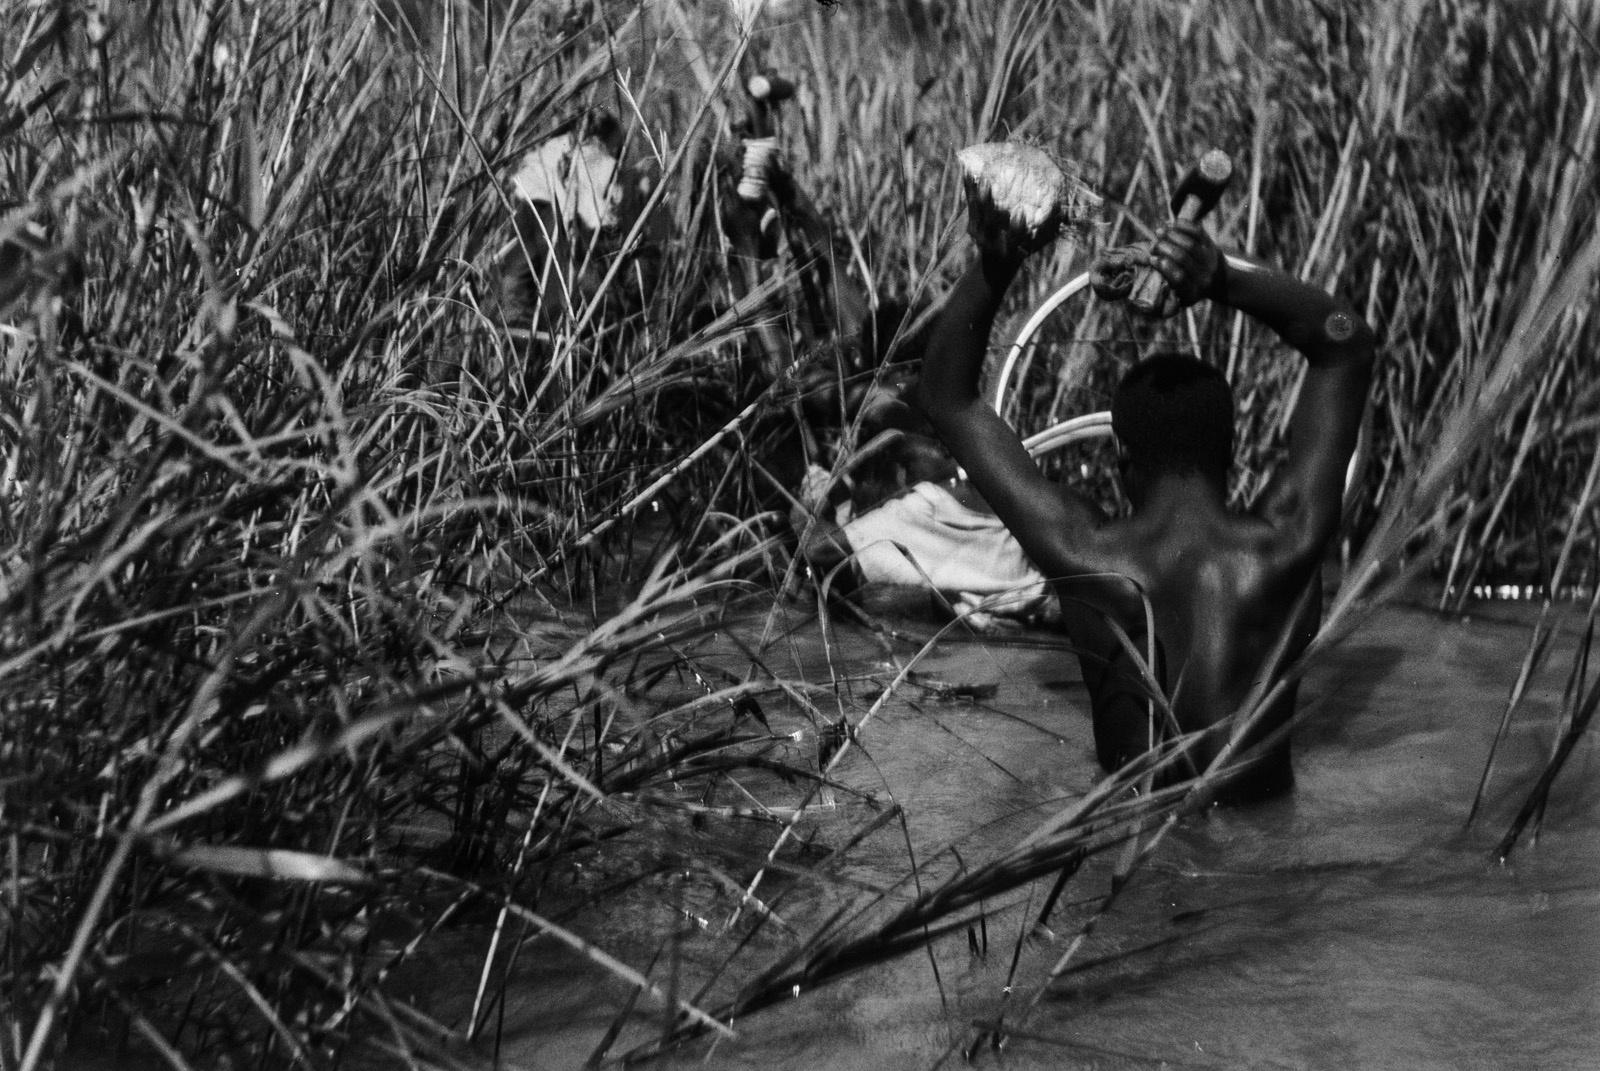 Между Капири Мпоши и рекой Лунсемфва. Носильщики пересекают Лунчу во время отлива